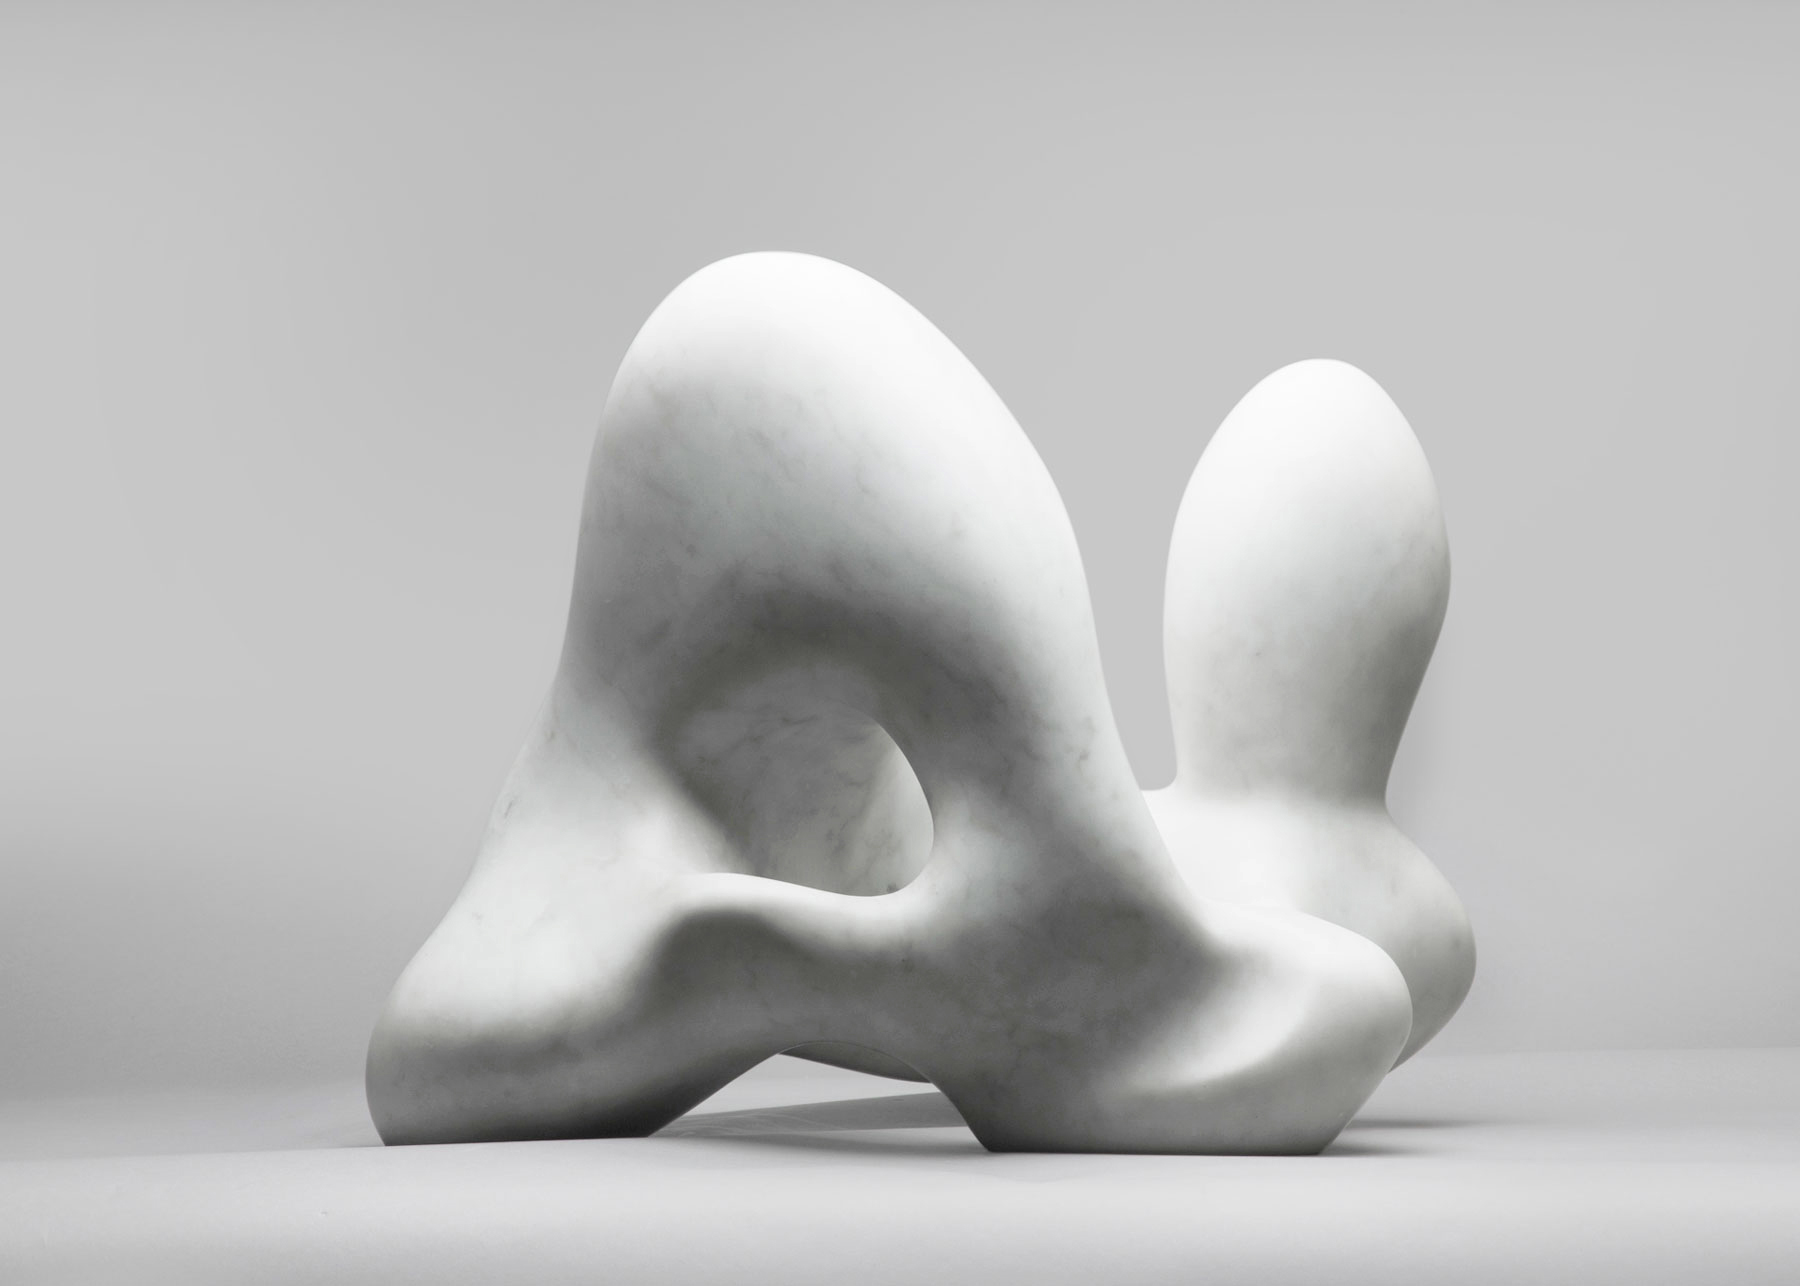 Jean (Hans) Arp, <i>Femme paysage</i>, ca. 1966